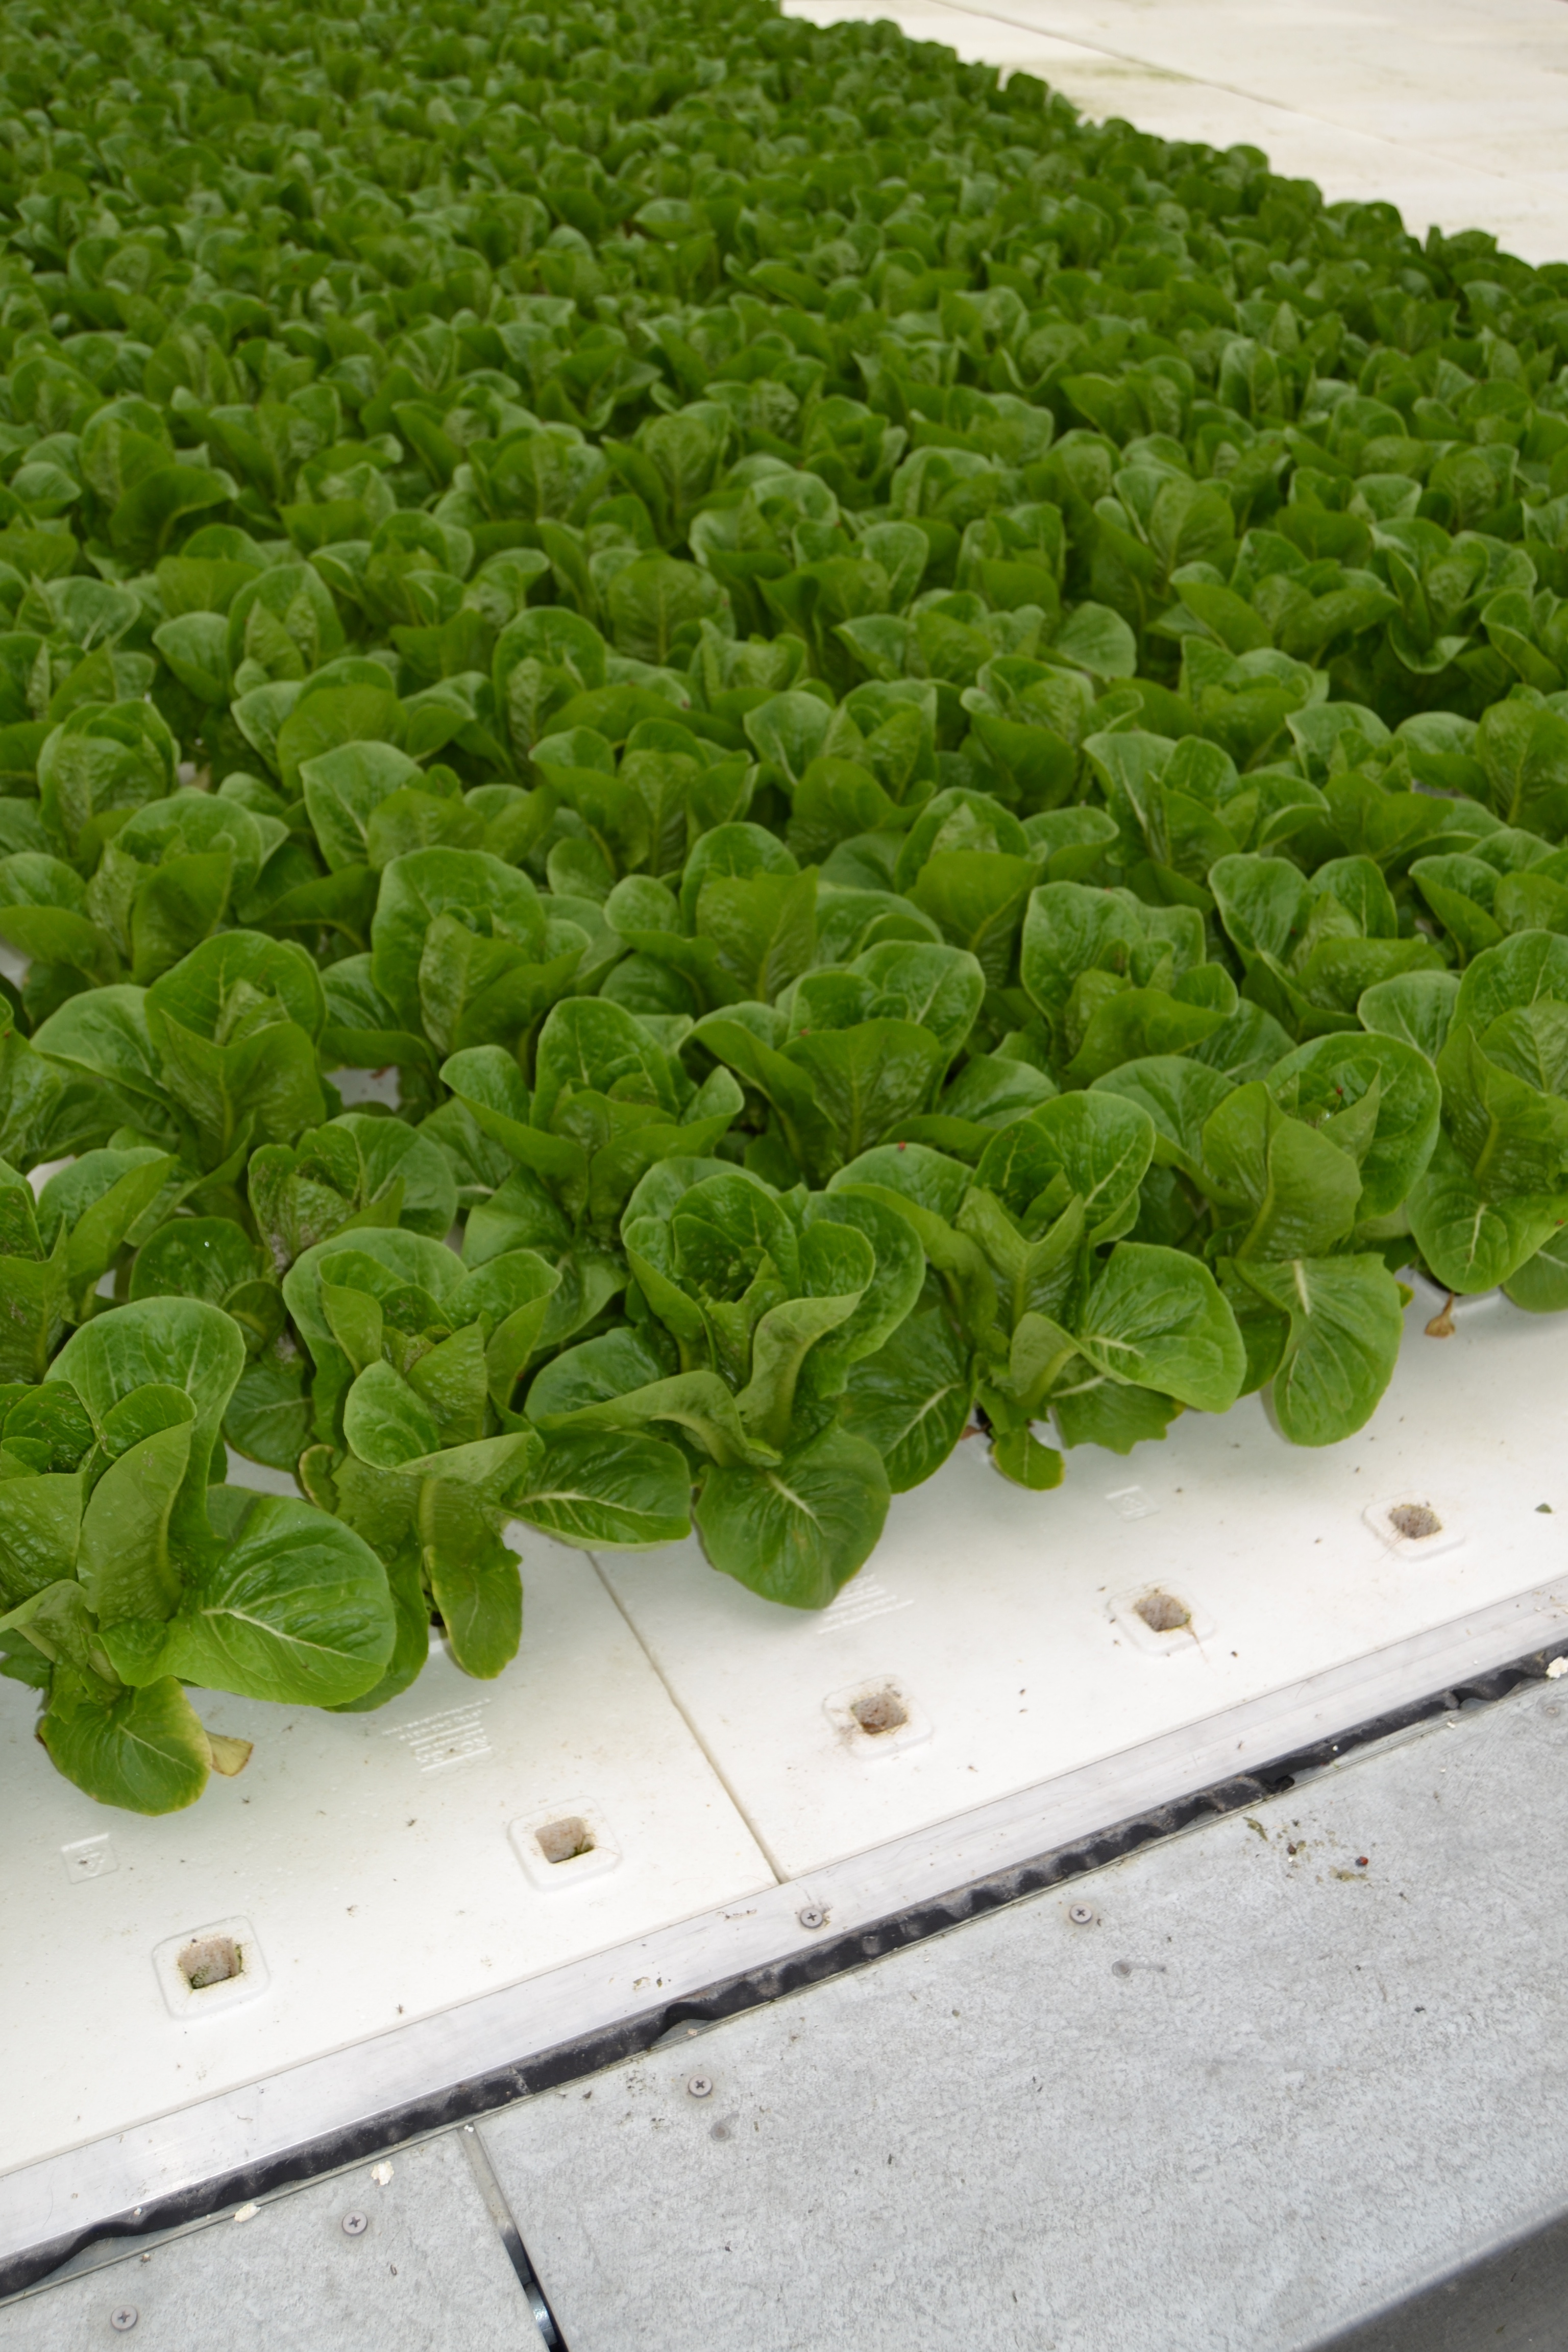 Hydroponic floating raft lettuce